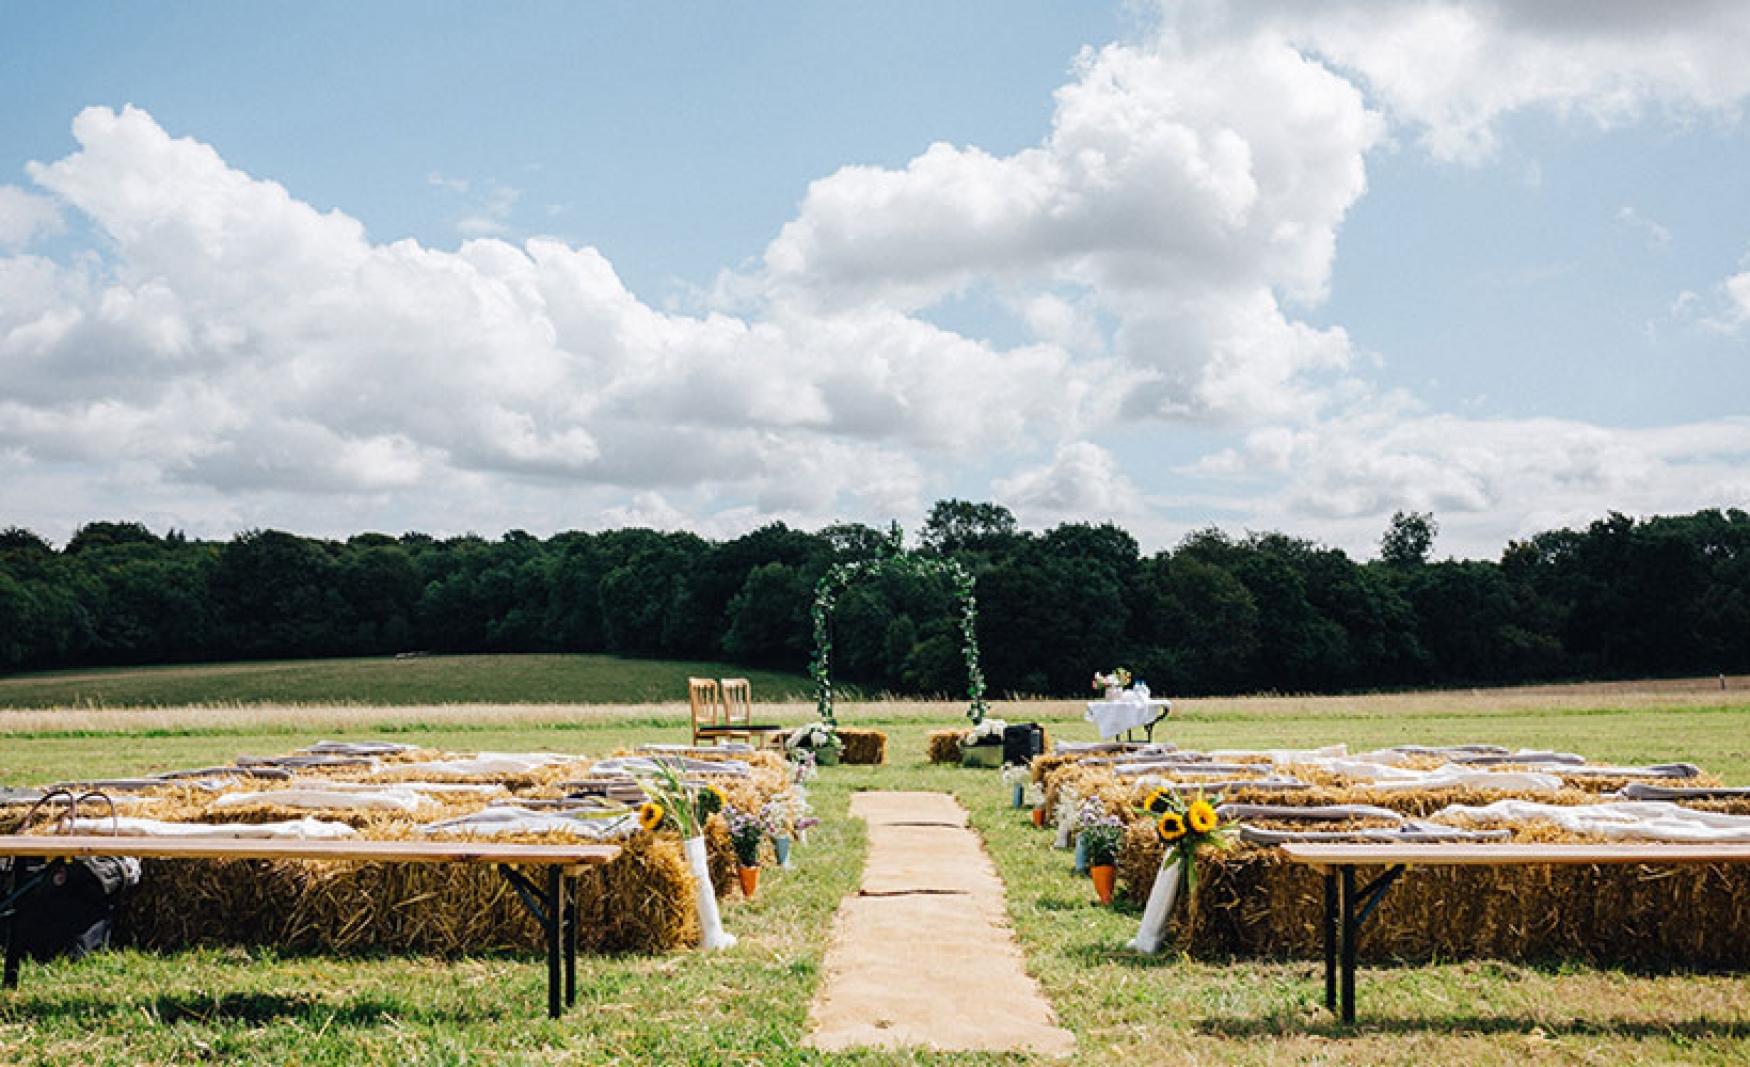 fiesta-fields-outdoor-wedding-events-company-tipi-surrey-sussex-phoenice-fields-leatherhead